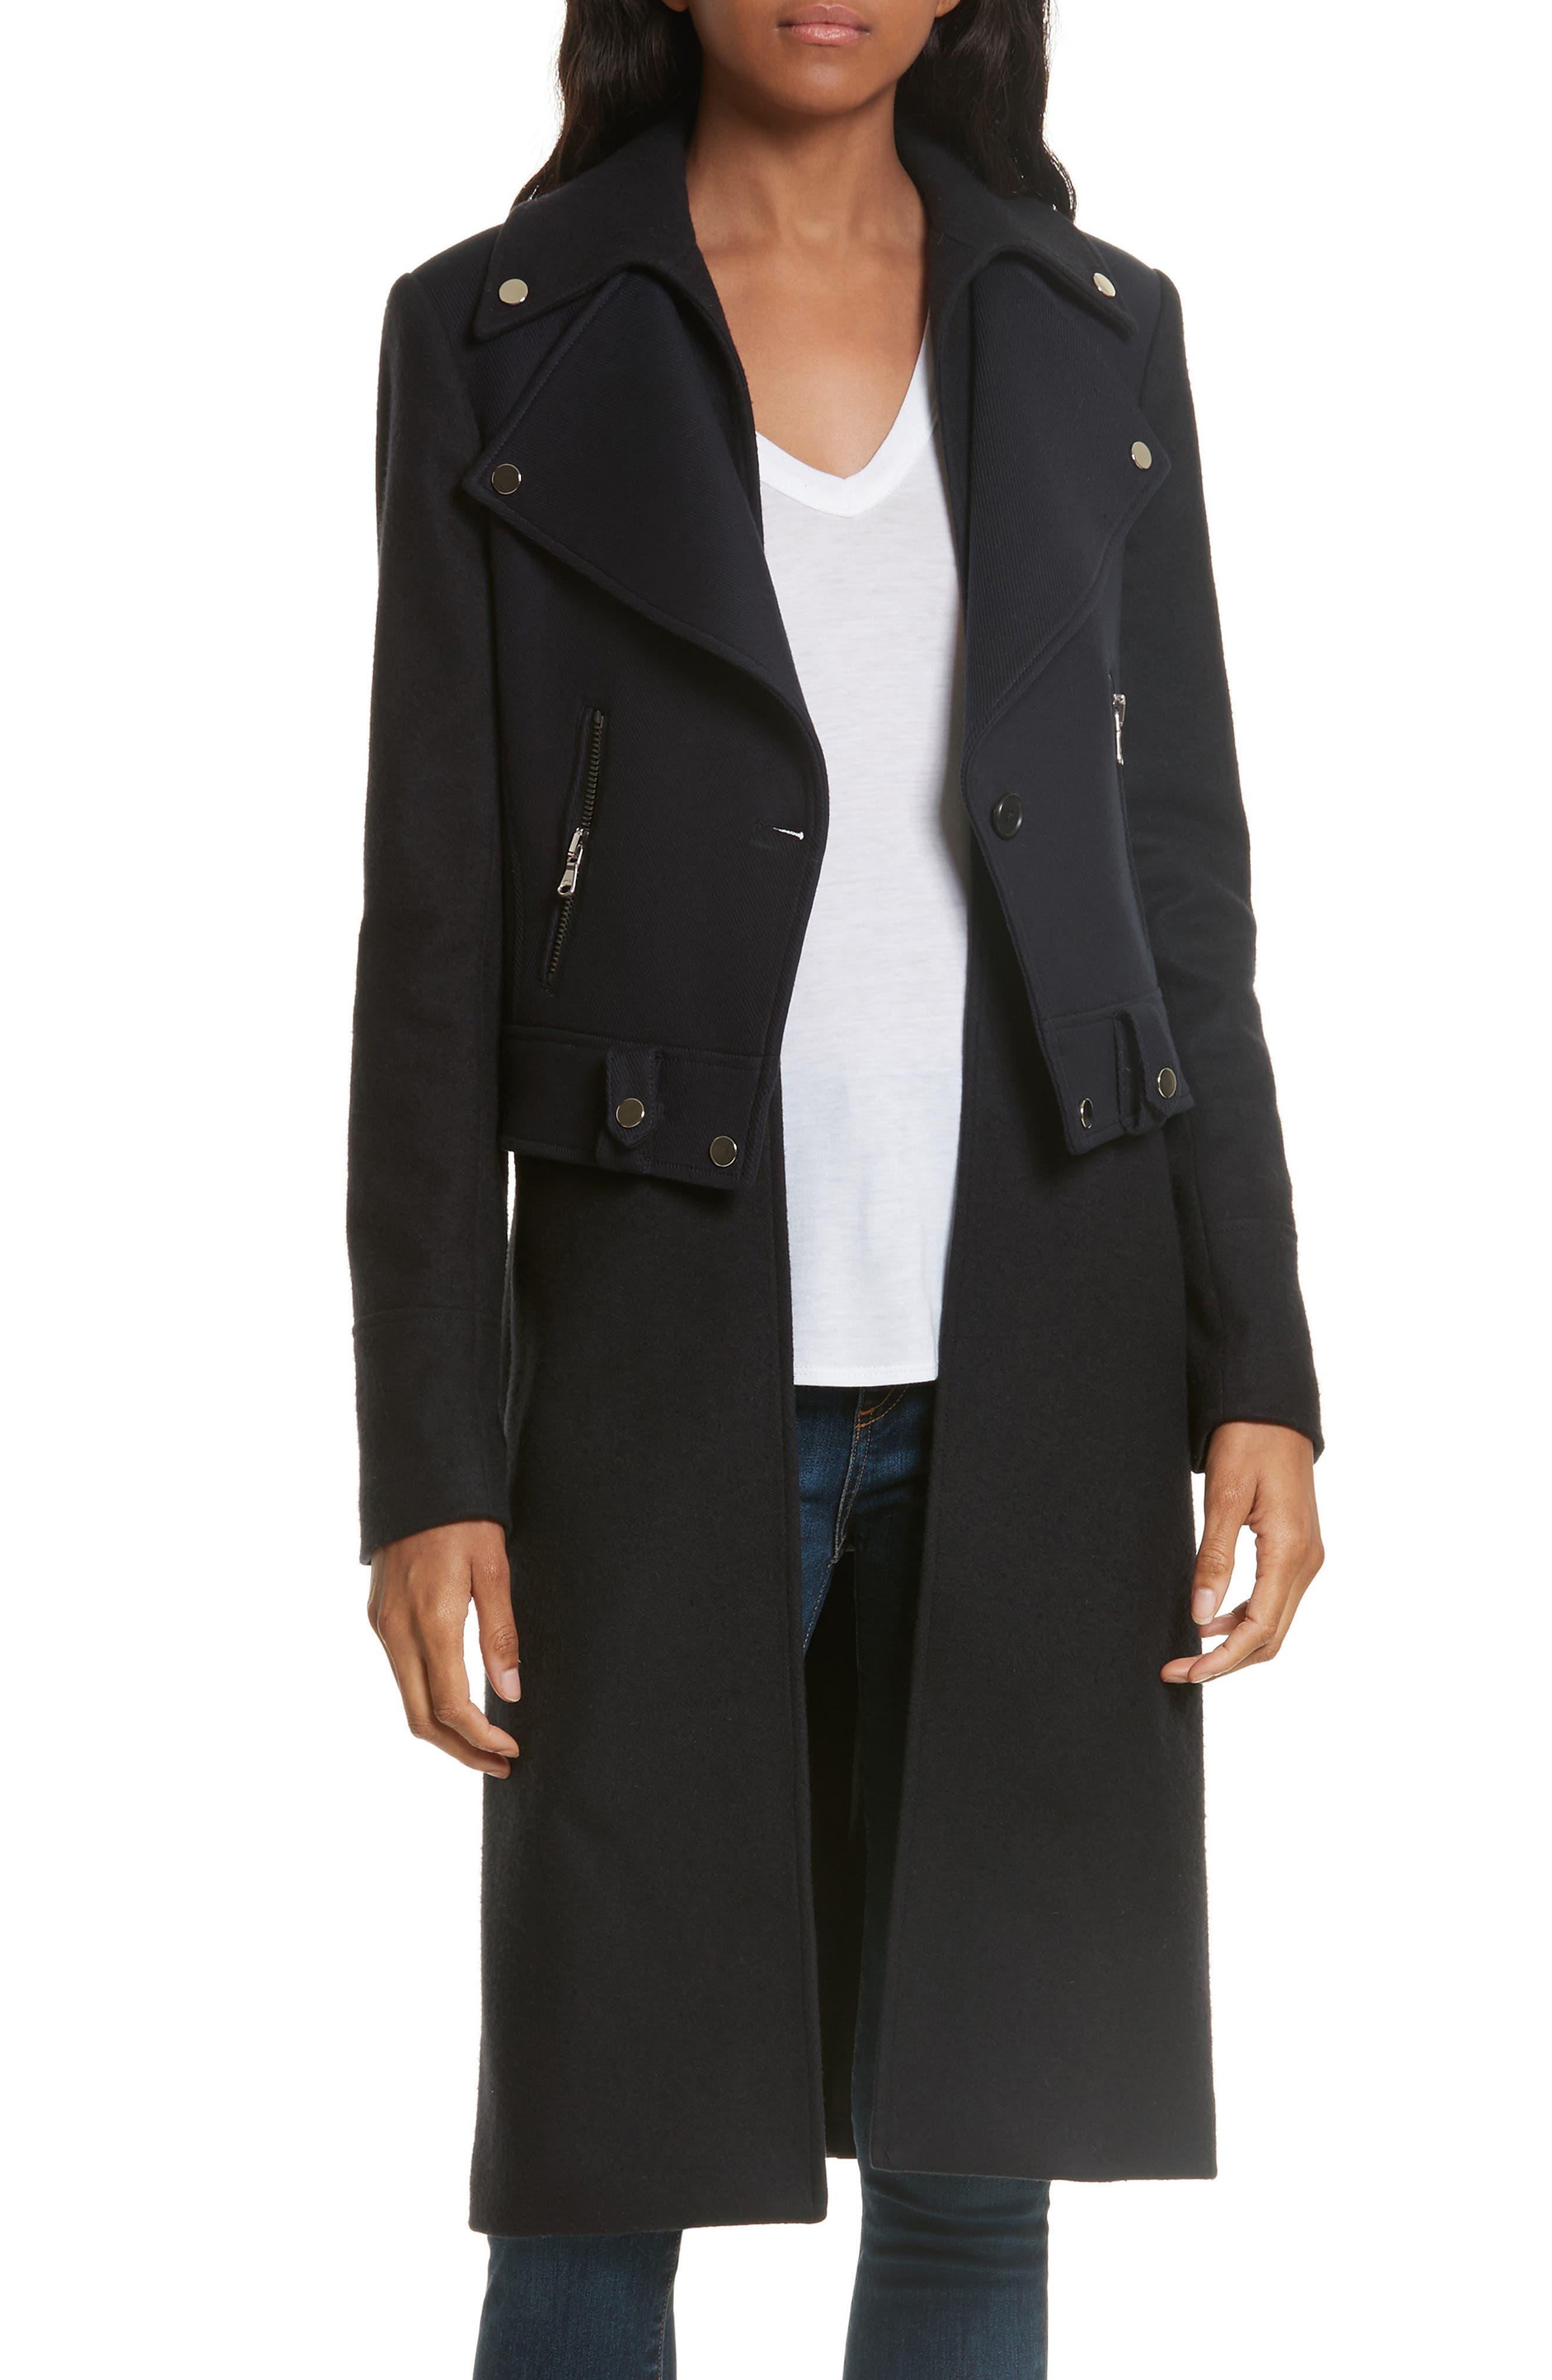 Veronica Beard Alcott Wool & Cashmere Blend Vest Coat